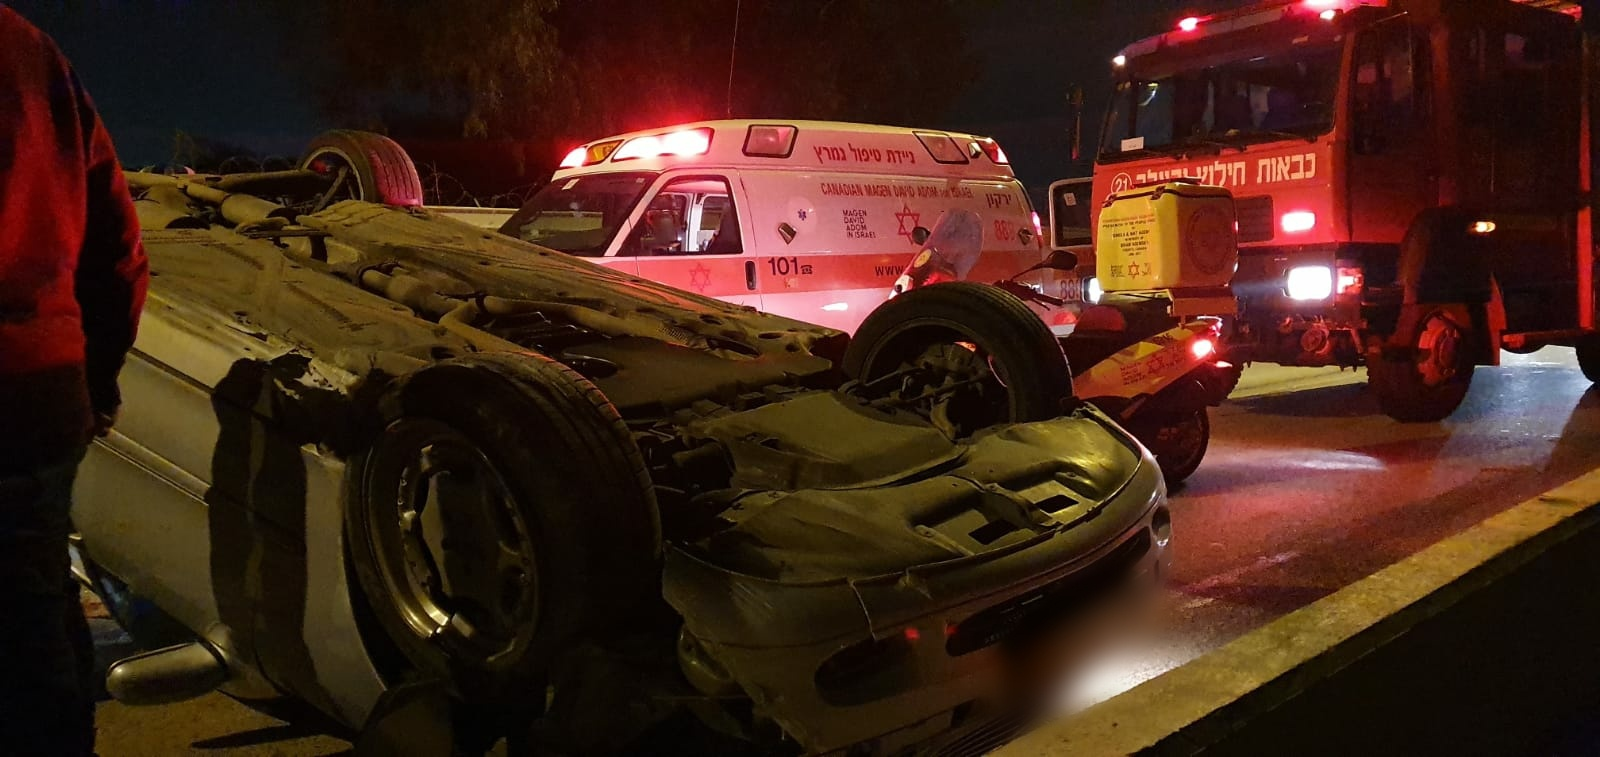 Photo of תאונה קשה בכביש 444: גבר כבן 50 פונה במצב בינוני